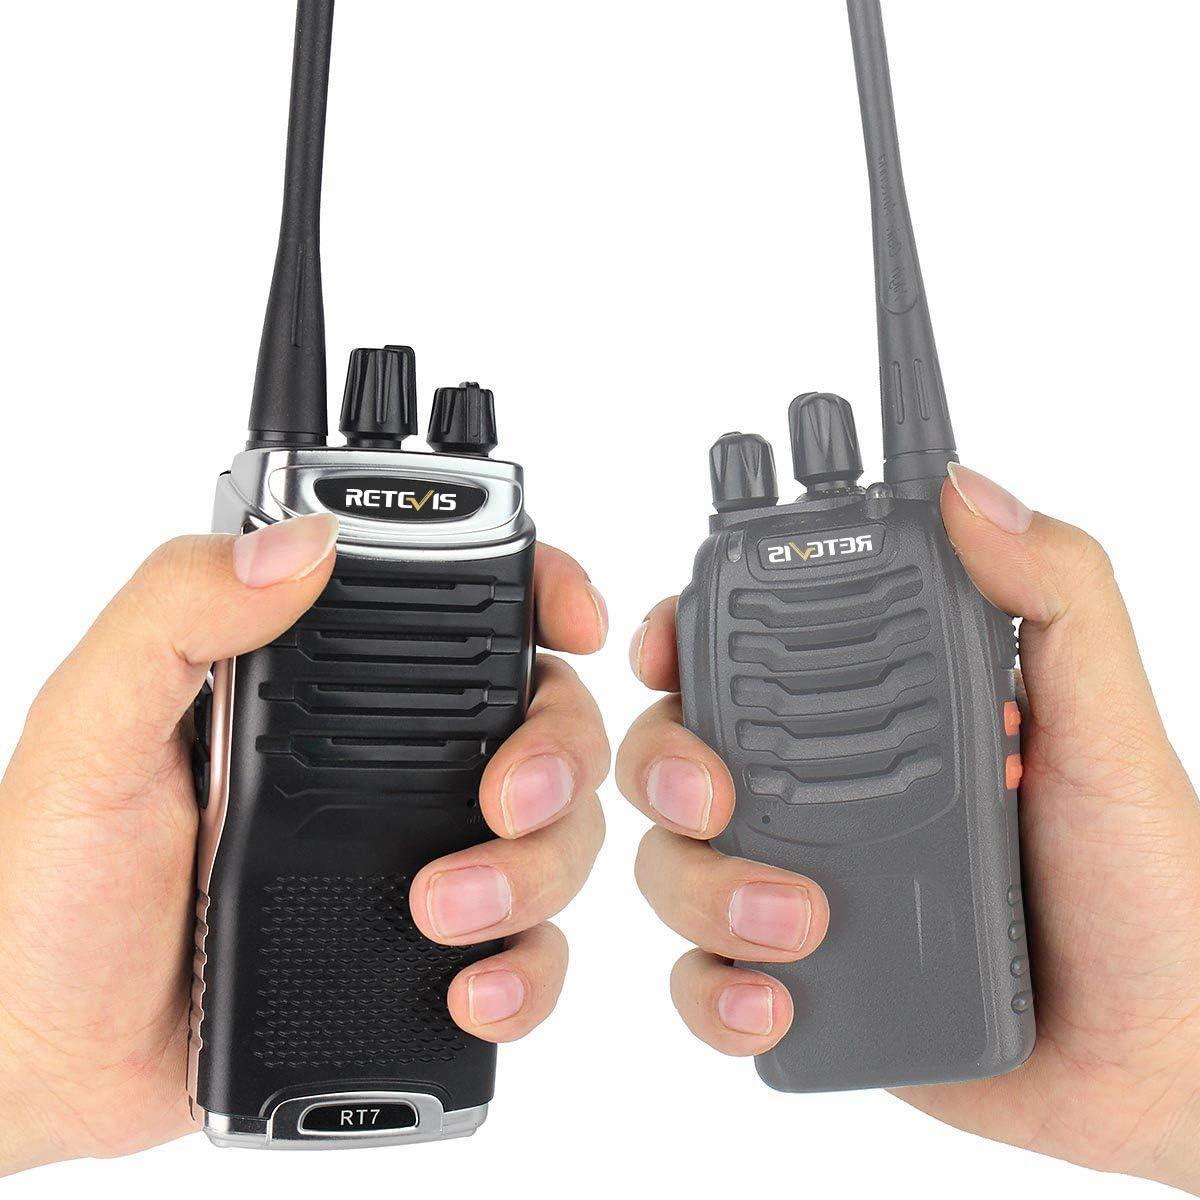 20*Retevis RT7 Walkie Talkies UHF400-470MHz 3W 16CH 2Way Radio+Earpiece+Cable US